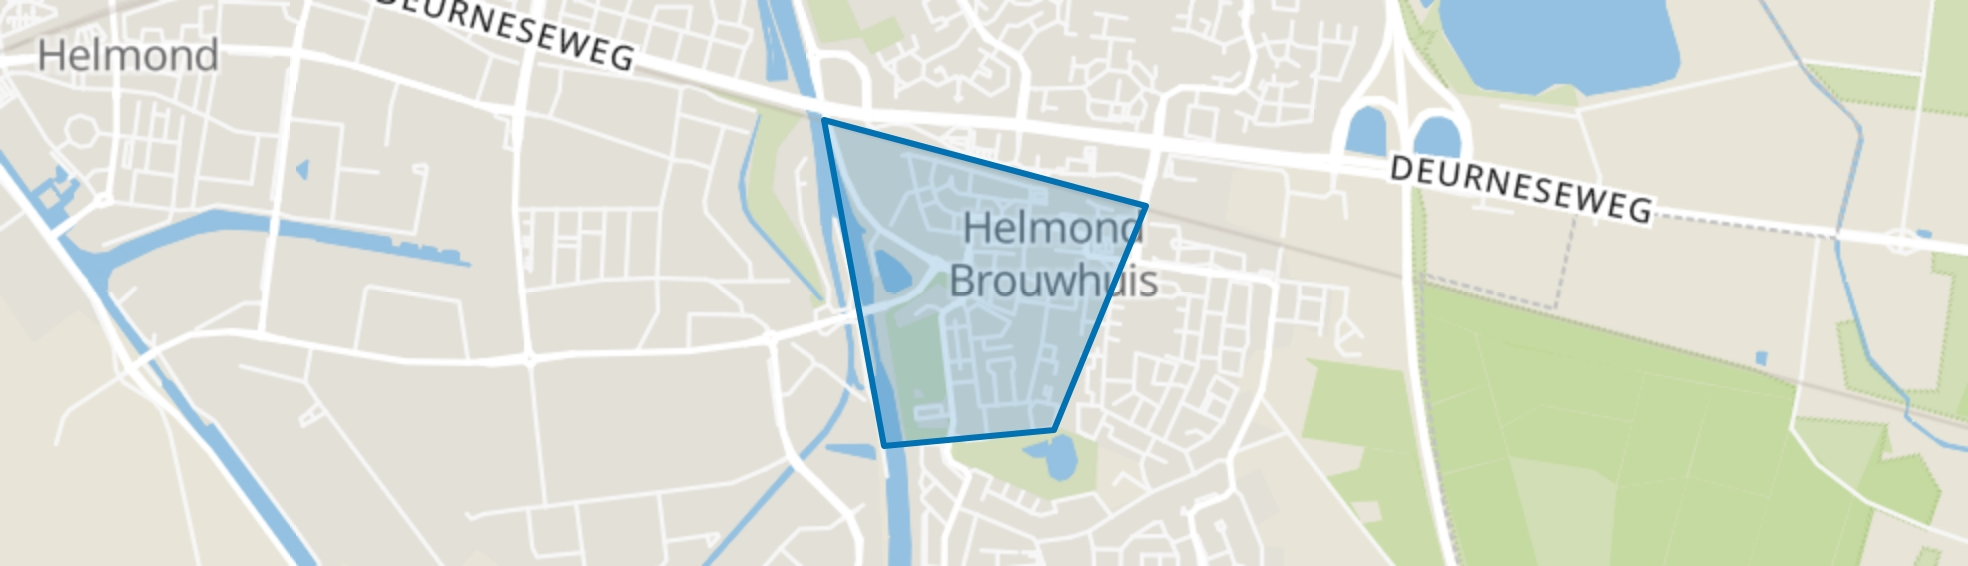 Brouwhuis-West, Helmond map